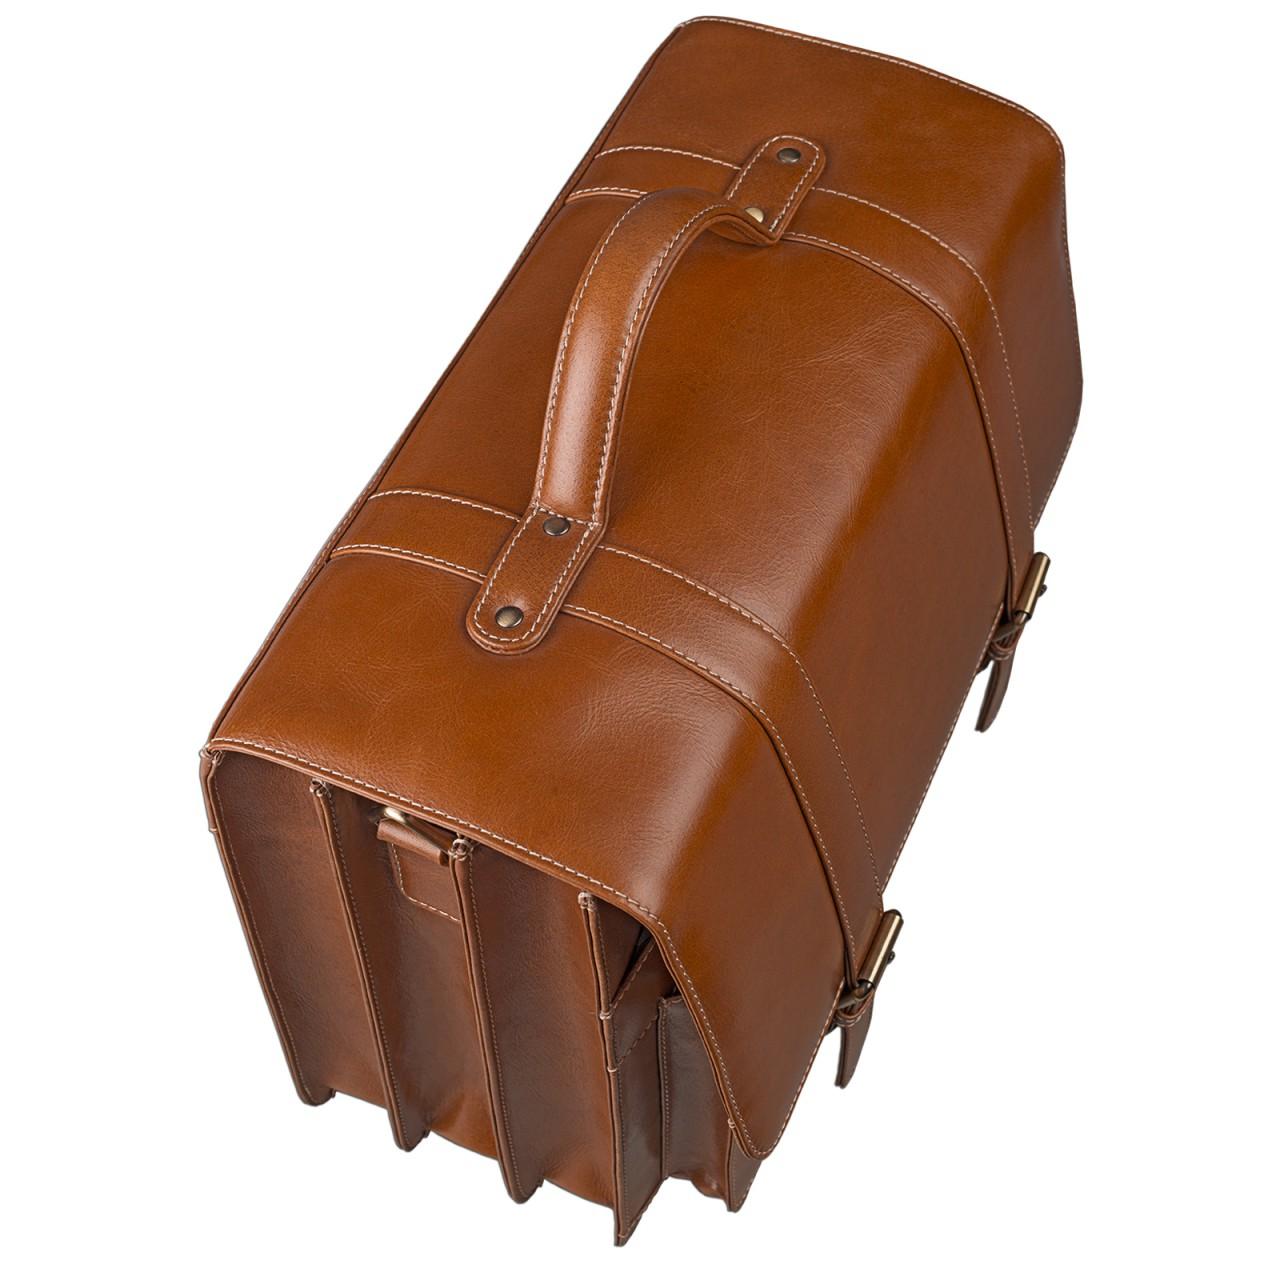 44257e2c7694e Vintage Aktentasche zum Umhängen 15.6 Zoll Braun